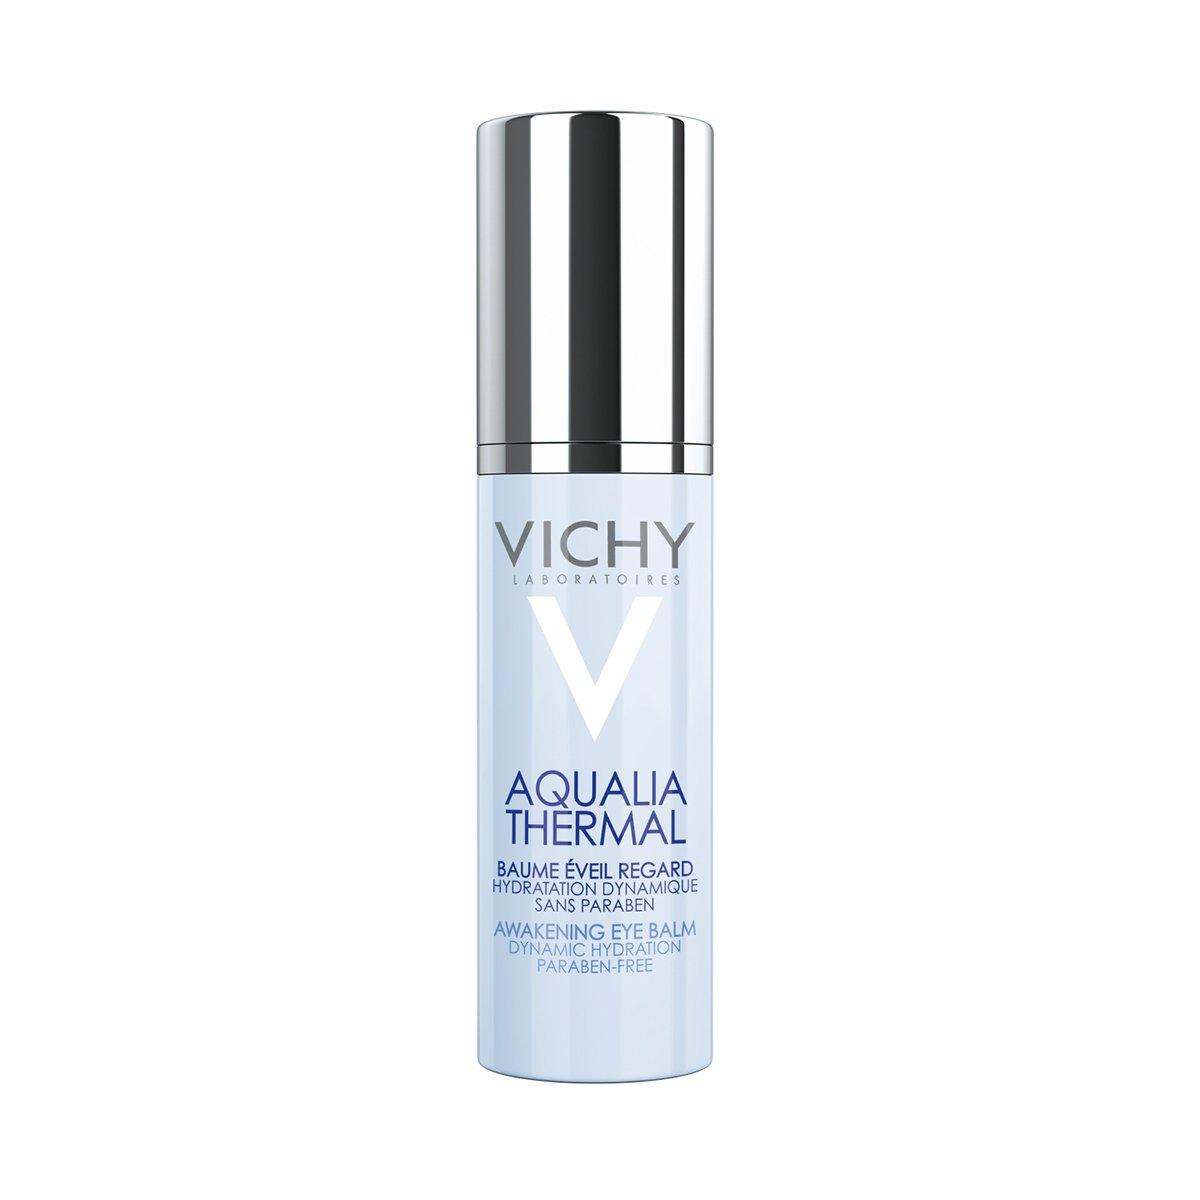 Vichy Aqualia Thermal Awakening Eye Cream, 0.5 Fl. Oz.